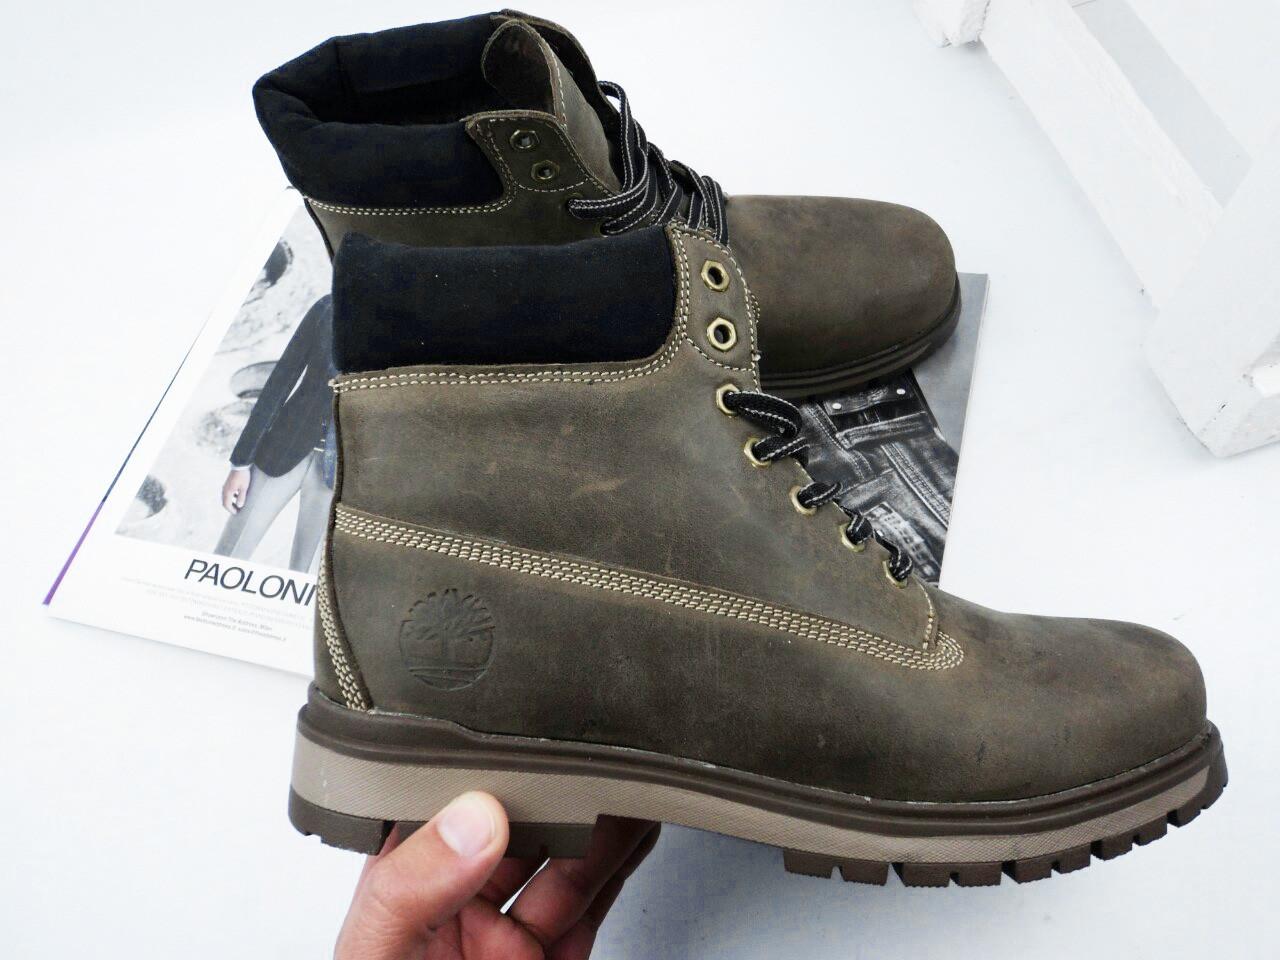 Мужские ботинки на меху Timberland цвета хаки топ реплика